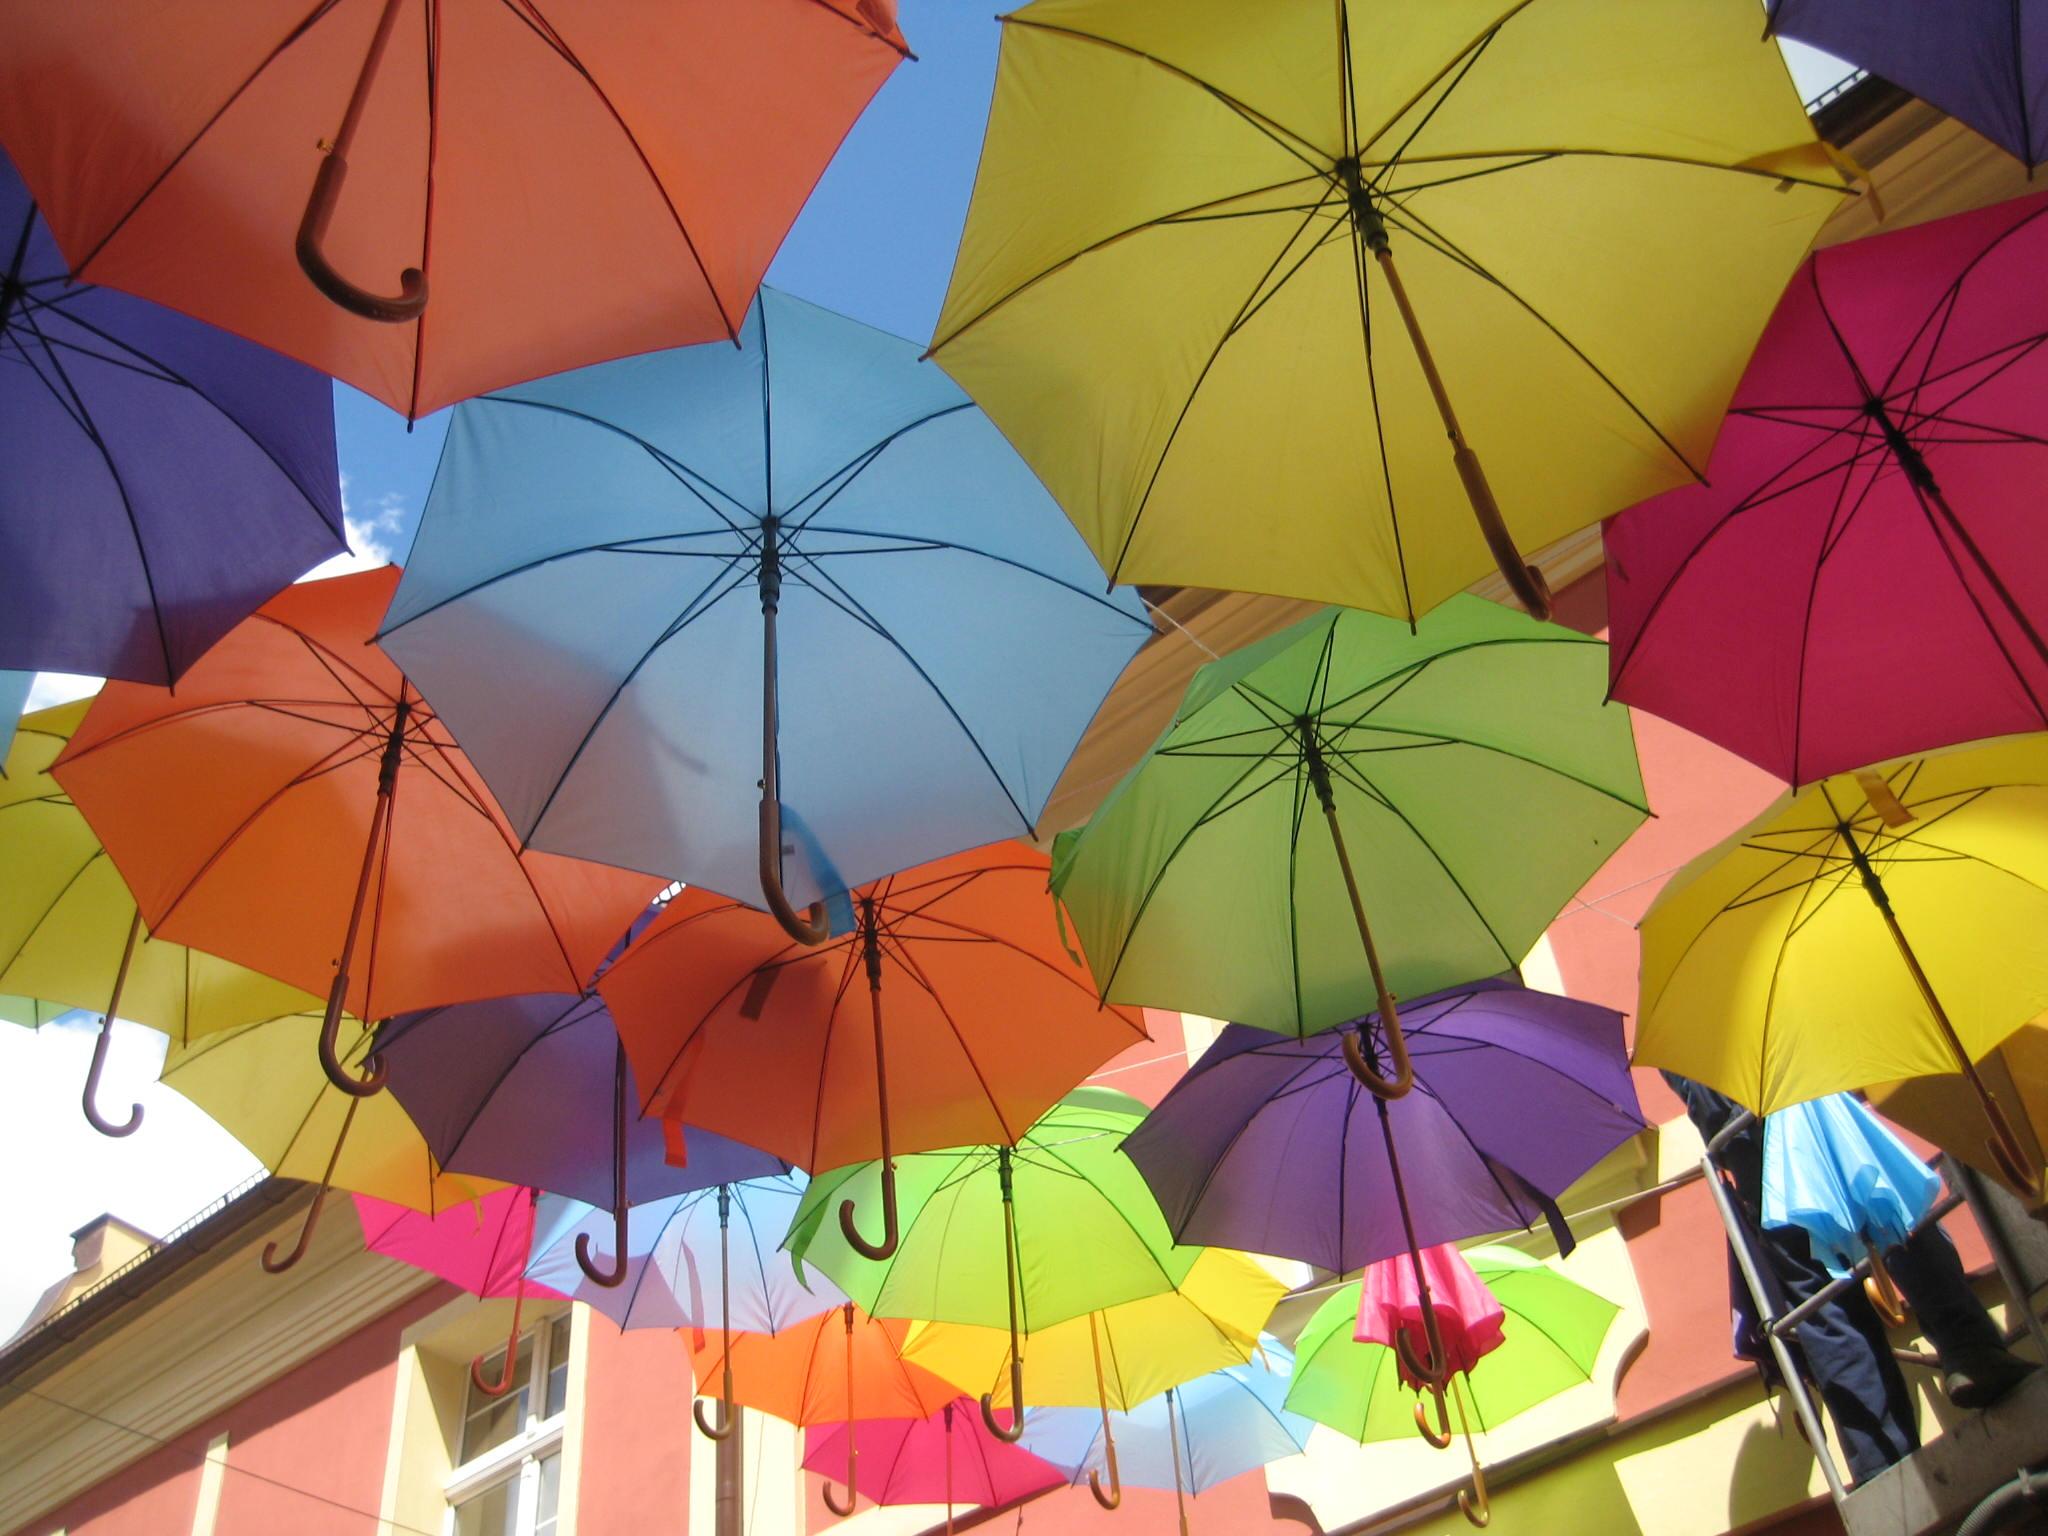 kolorowe parasole leszno - Jacek Marciniak